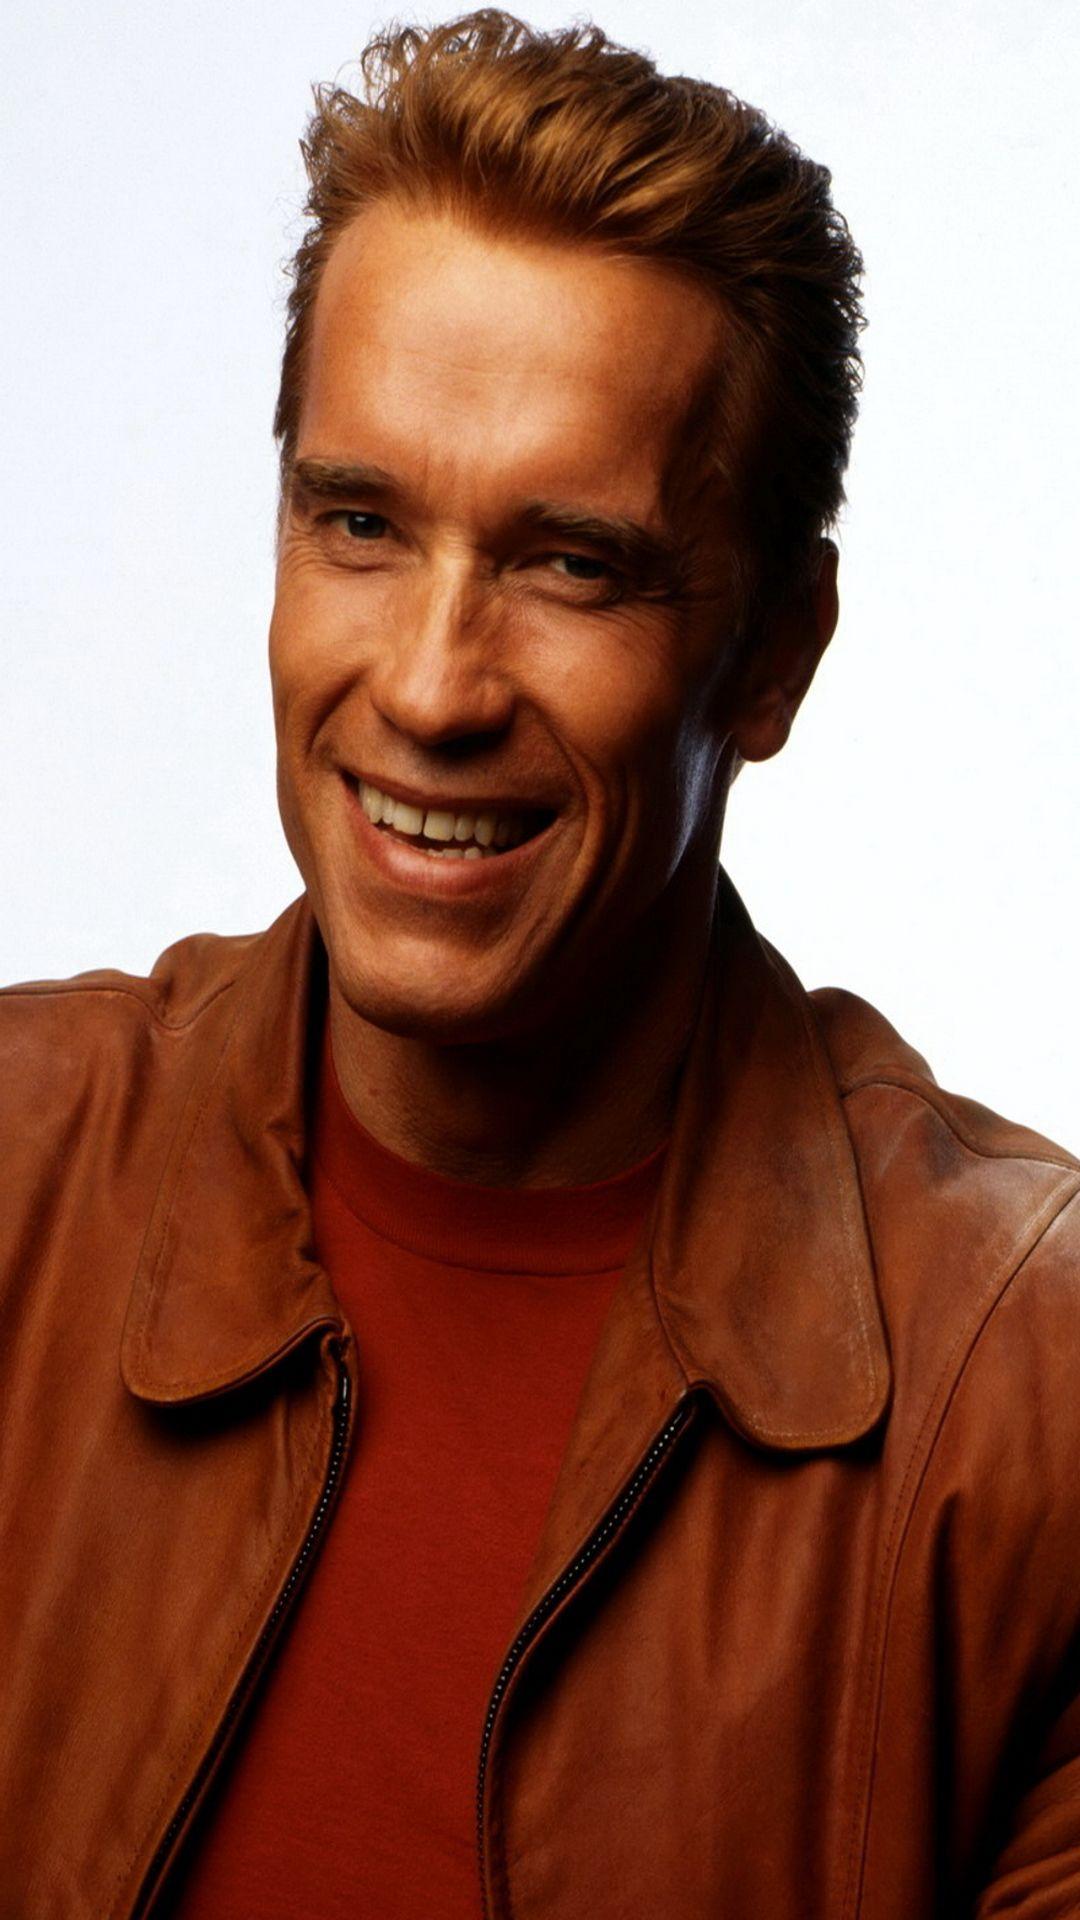 Arnold Image Hd